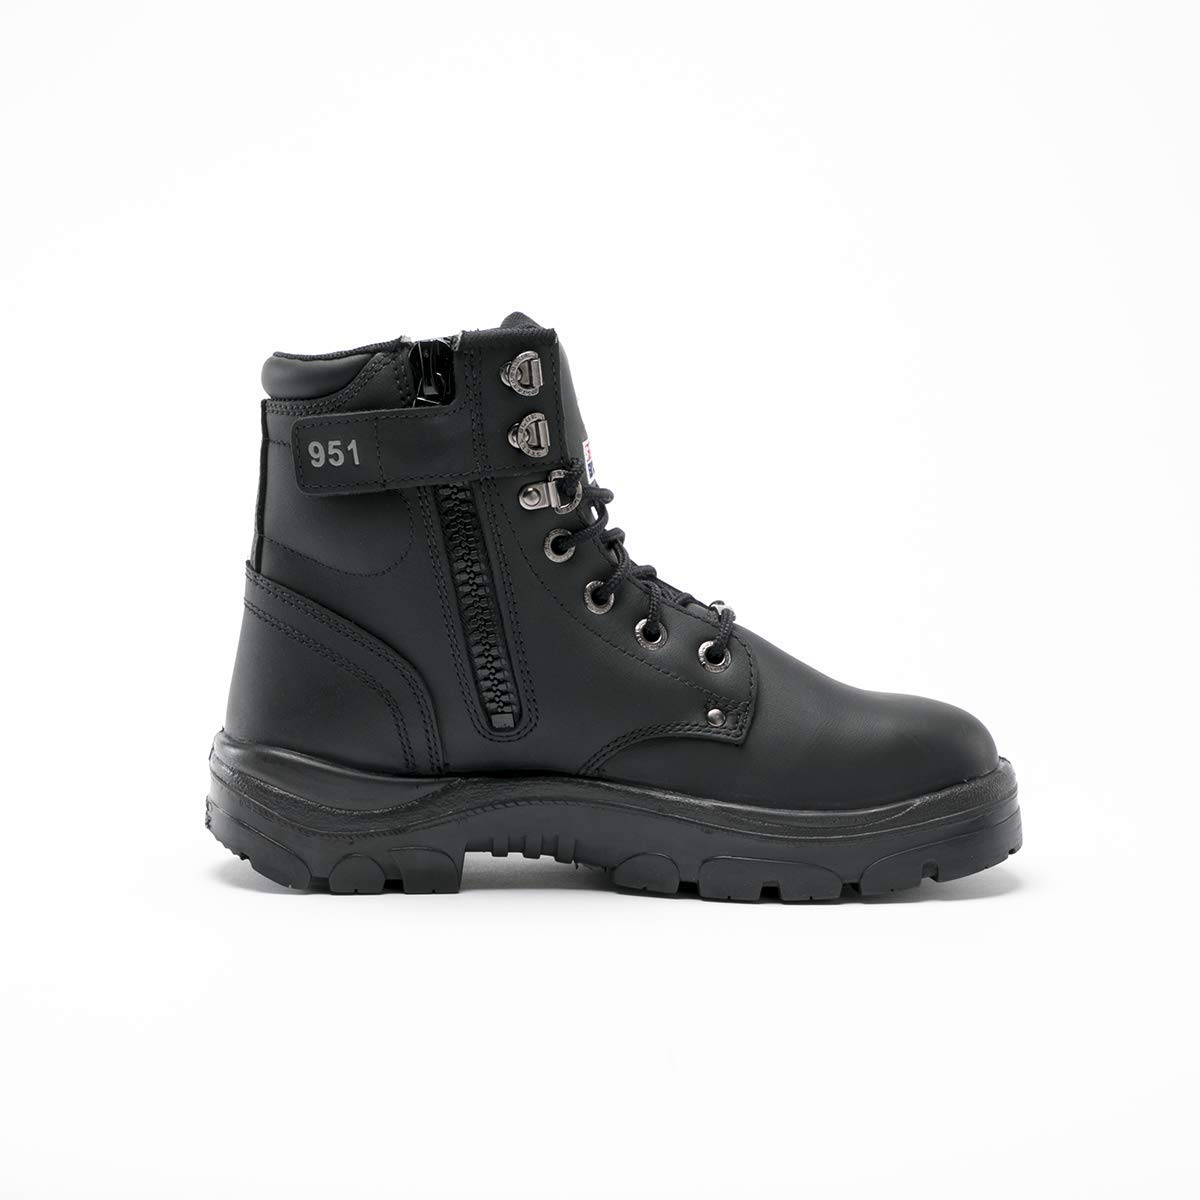 3f3aad28dcc Amazon.com: Steel Blue 312951M-070-BLK Argyle Zip Boot, Black ...